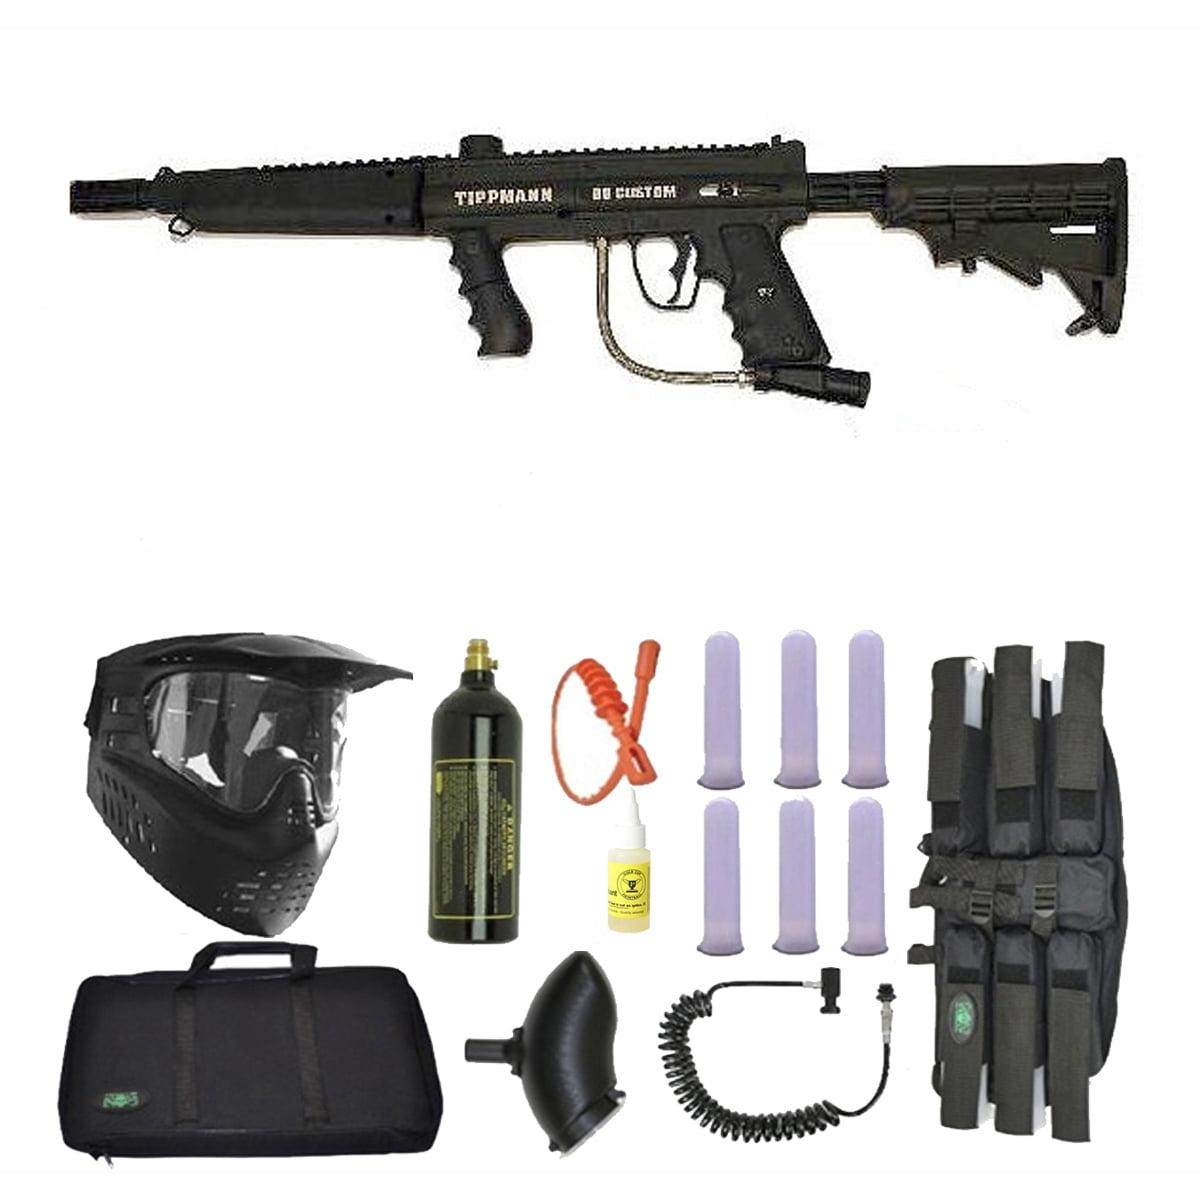 Paintball Gun Custom Tippmann Drawing Cad Drawings Of 98 Mcarterbrowncom Act Marker Skull Flatline Sniper Set 450x450